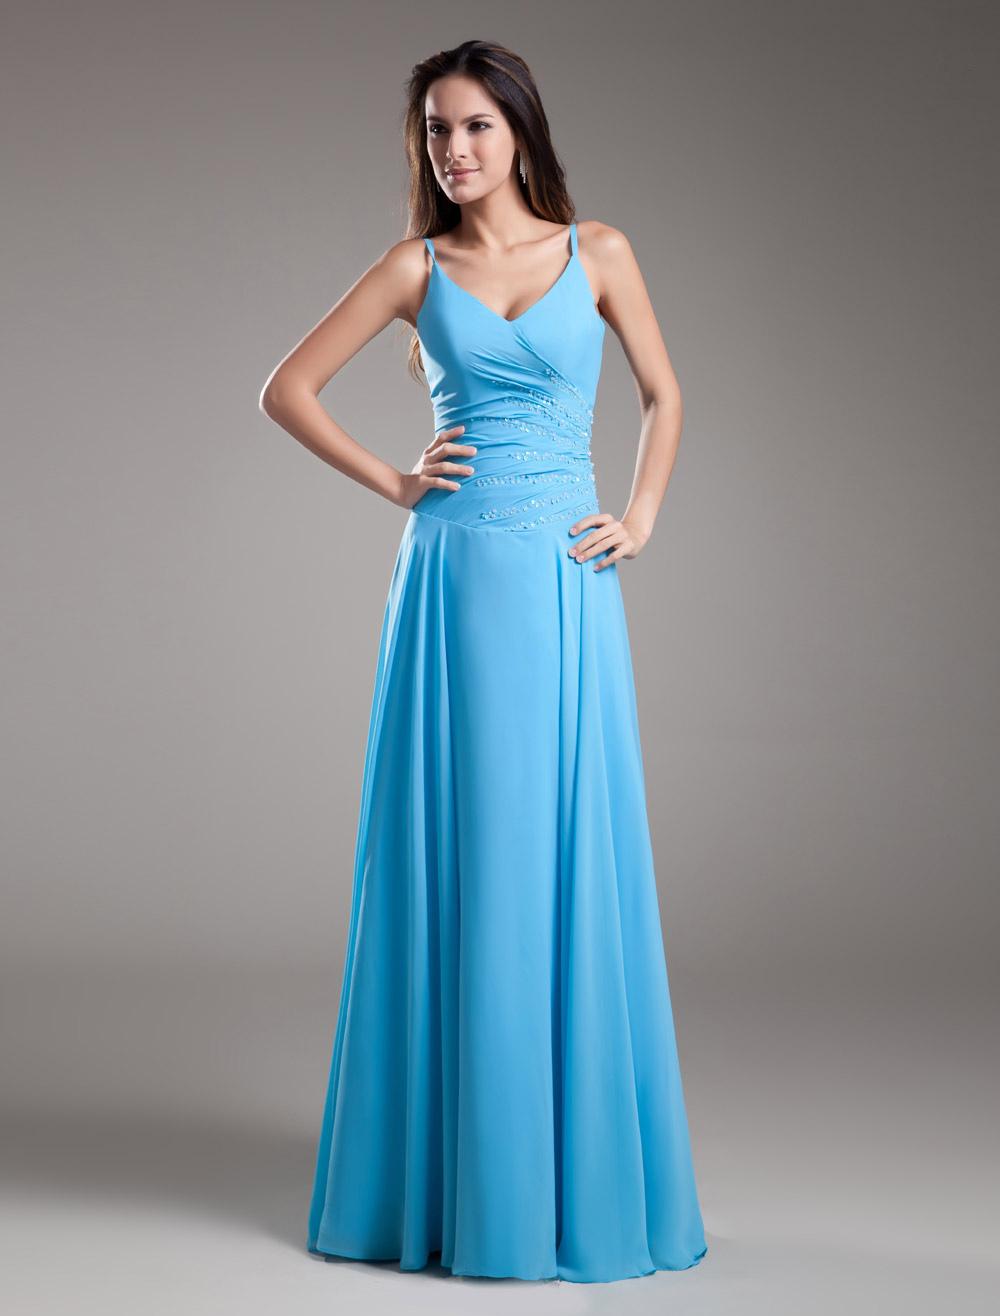 Chiffon Evening Dress Aqua V Neck Occasion Dress Spaghetti Strap Beading Long Bridesmaid Dress (Wedding Bridesmaid Dresses) photo